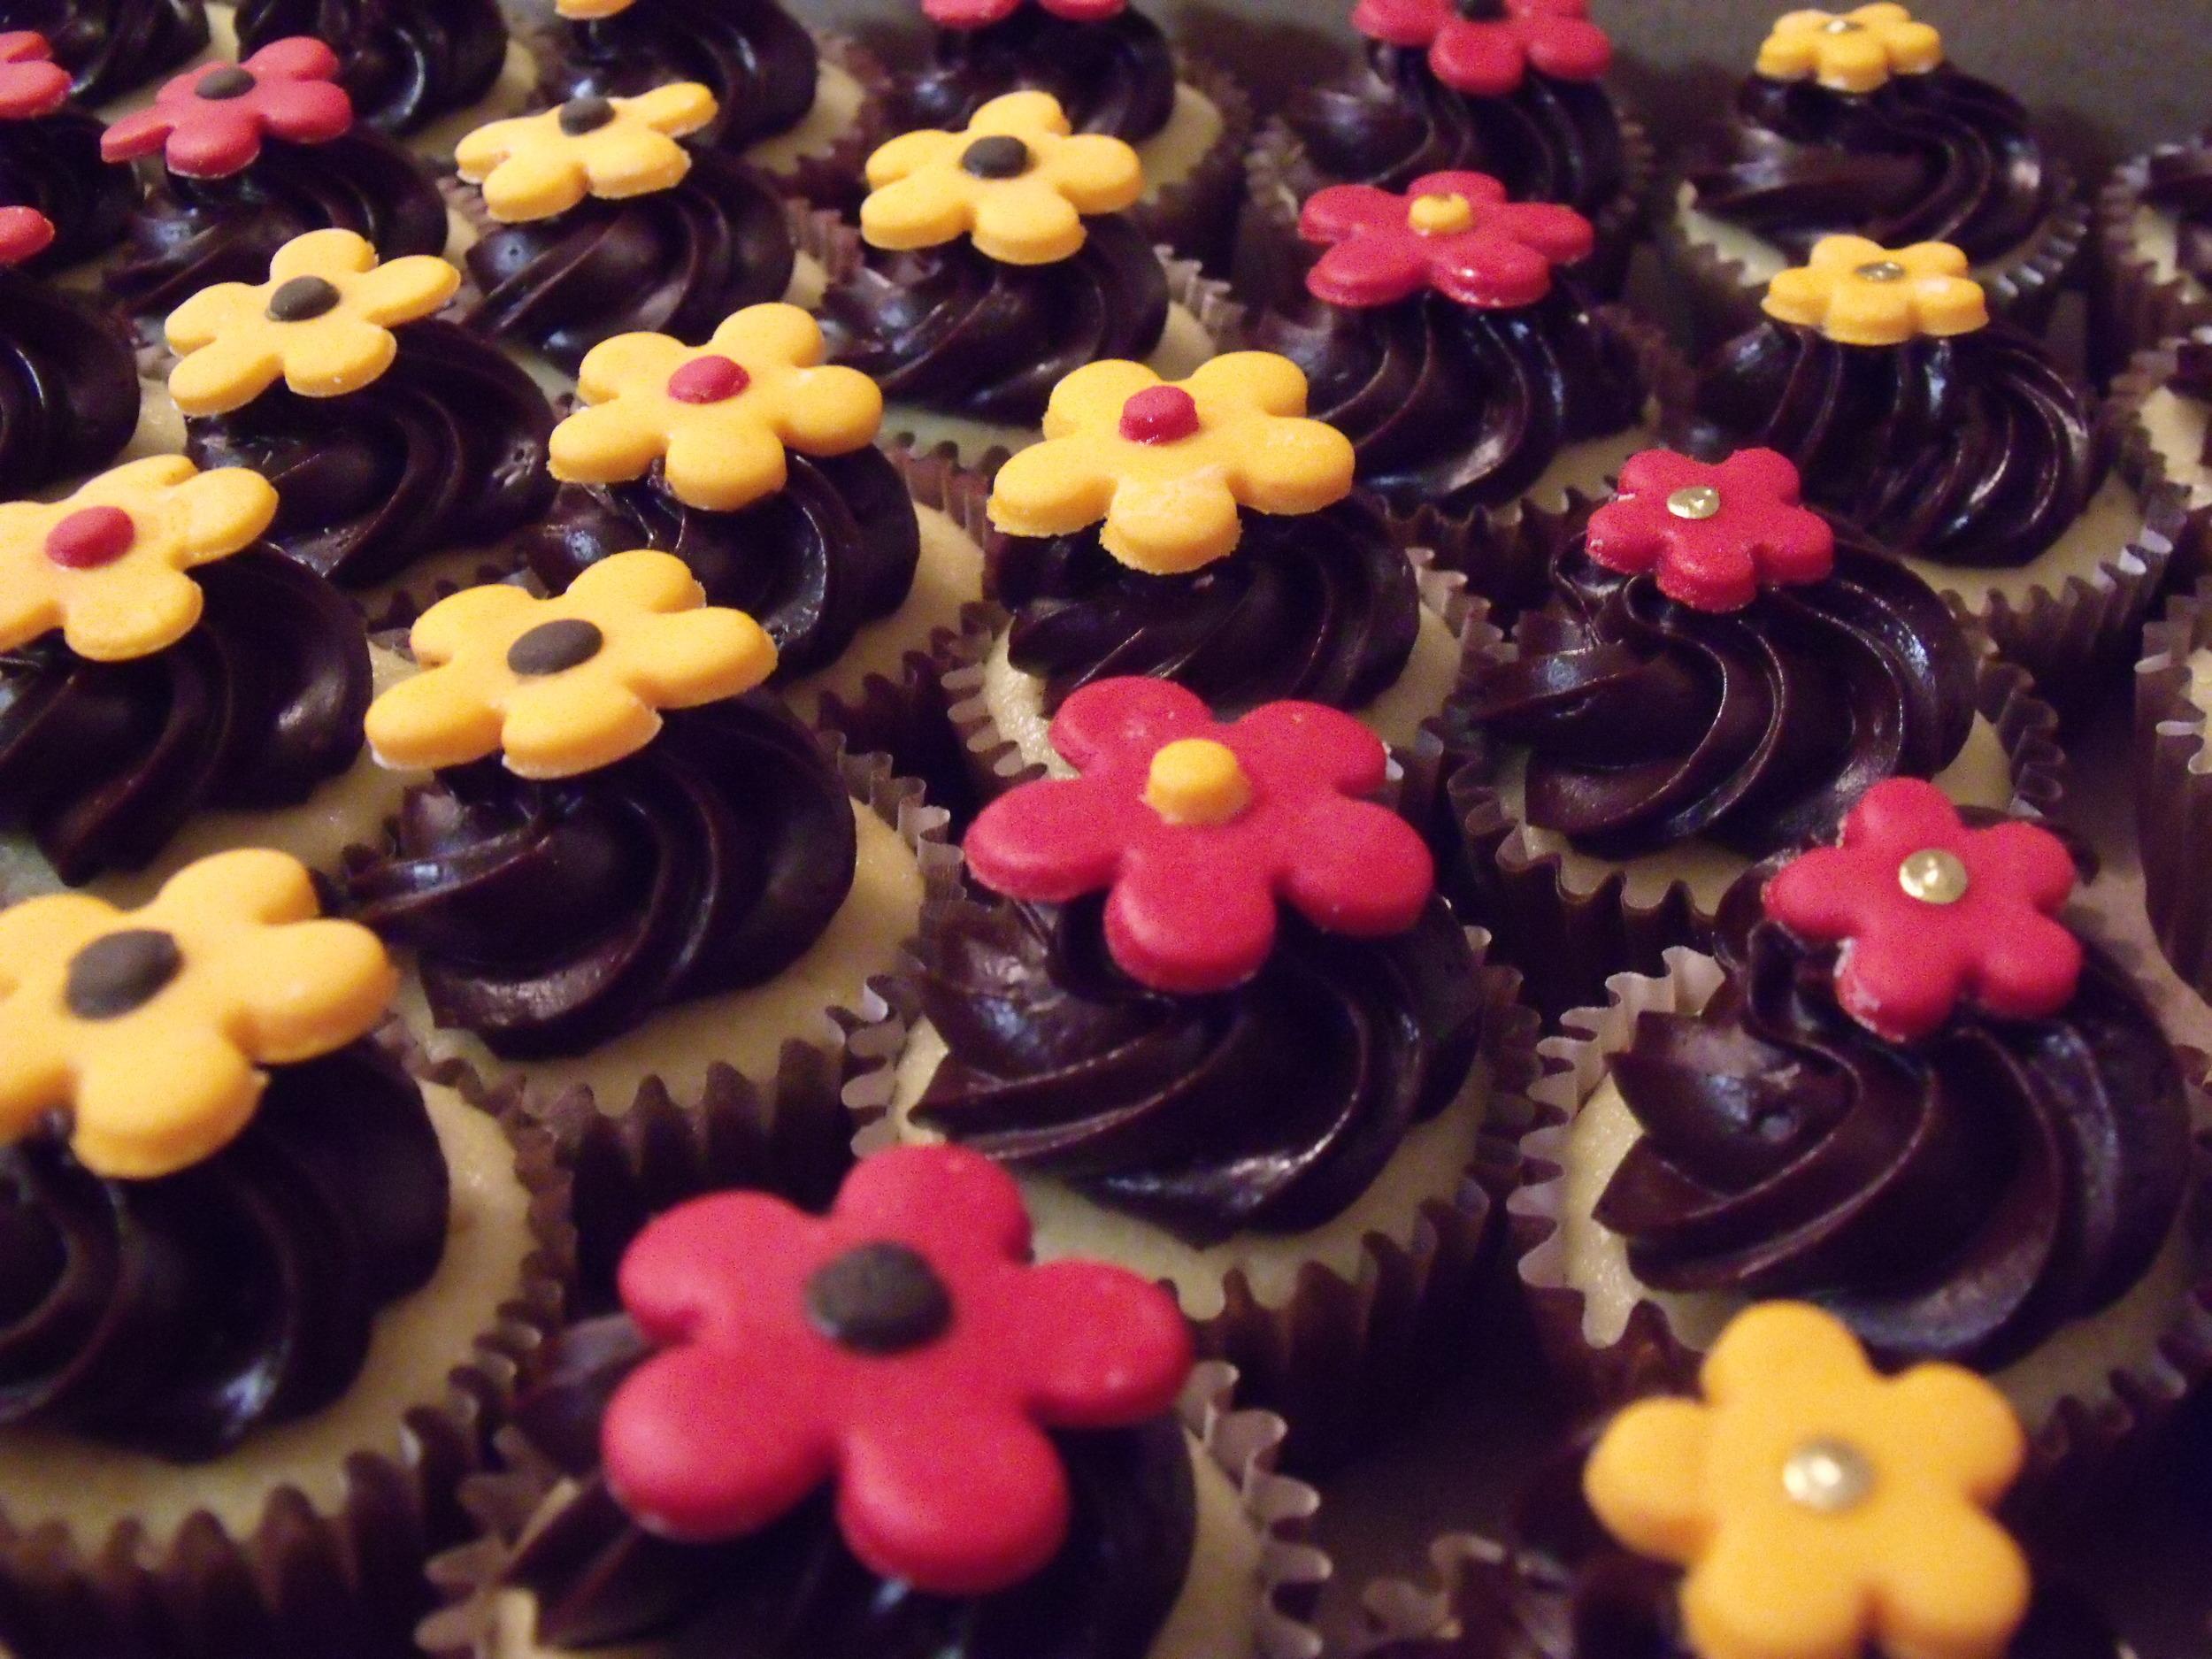 flores 8 BLOG FESTA.JPG